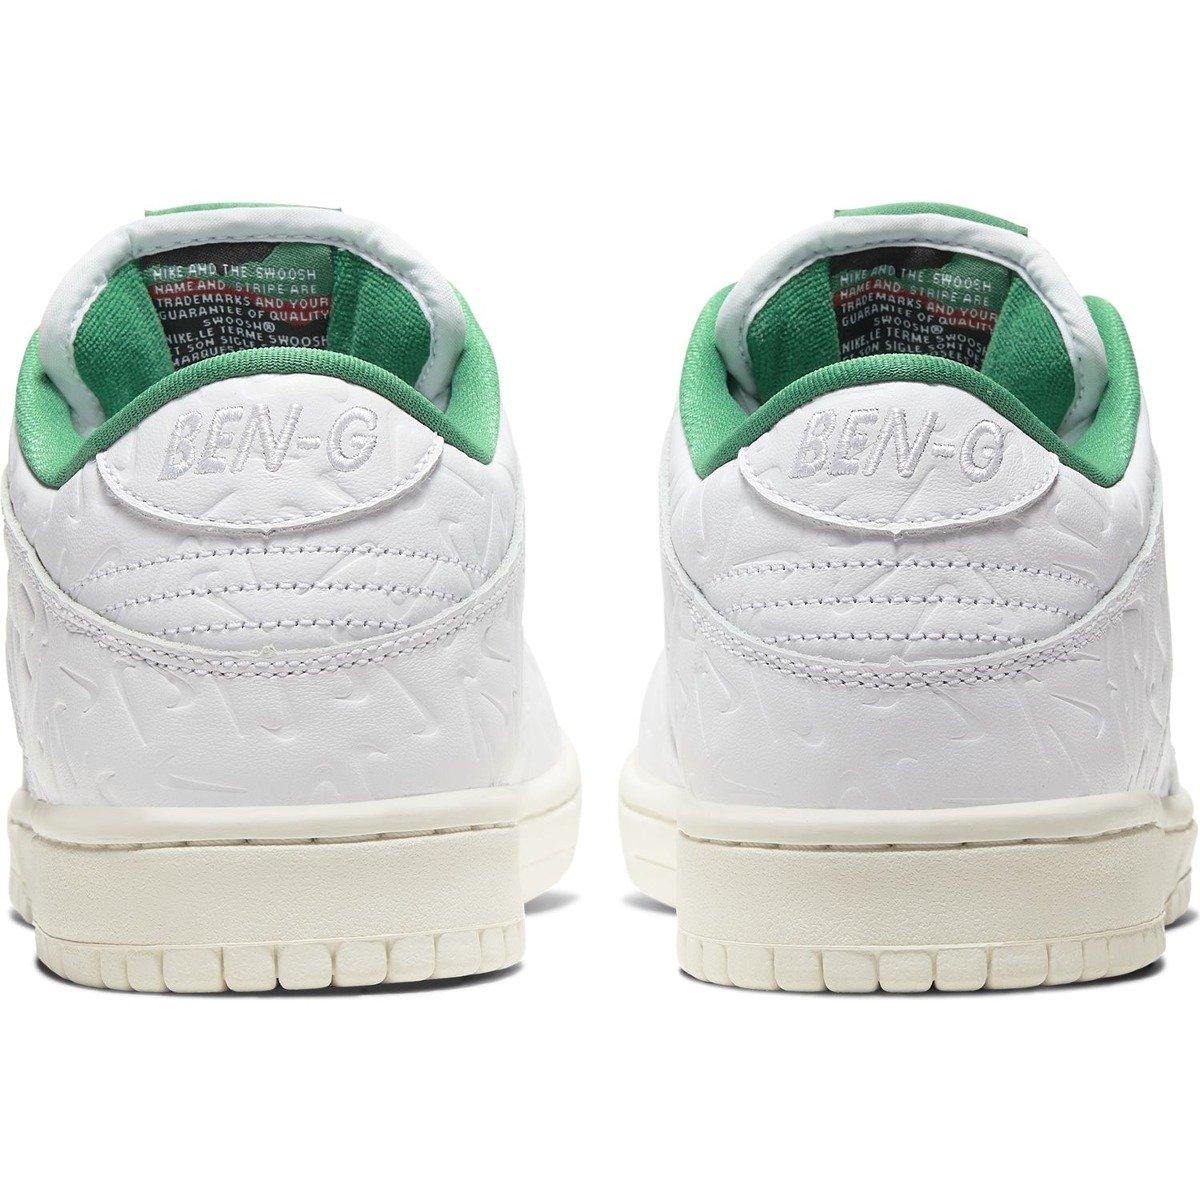 Nike black beige green : Shoes, Trousers, T Shirt